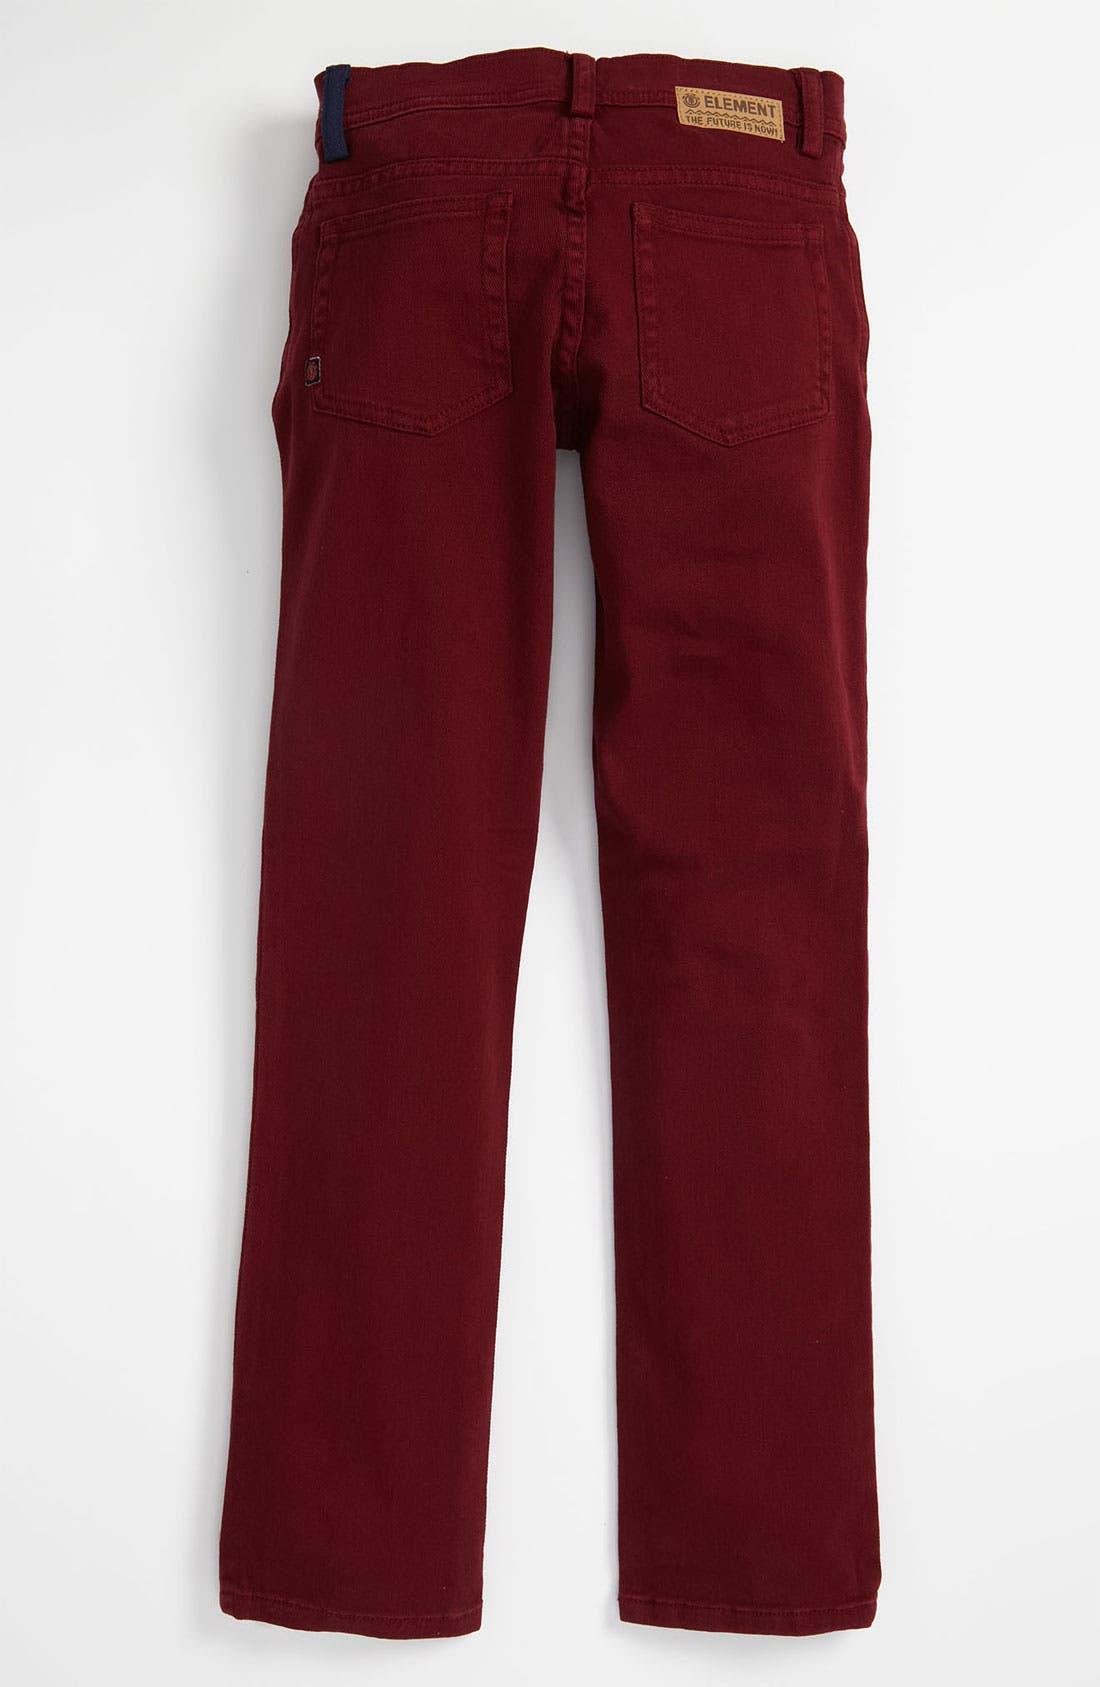 Main Image - Element 'Crosstown' Jeans (Big Boys)